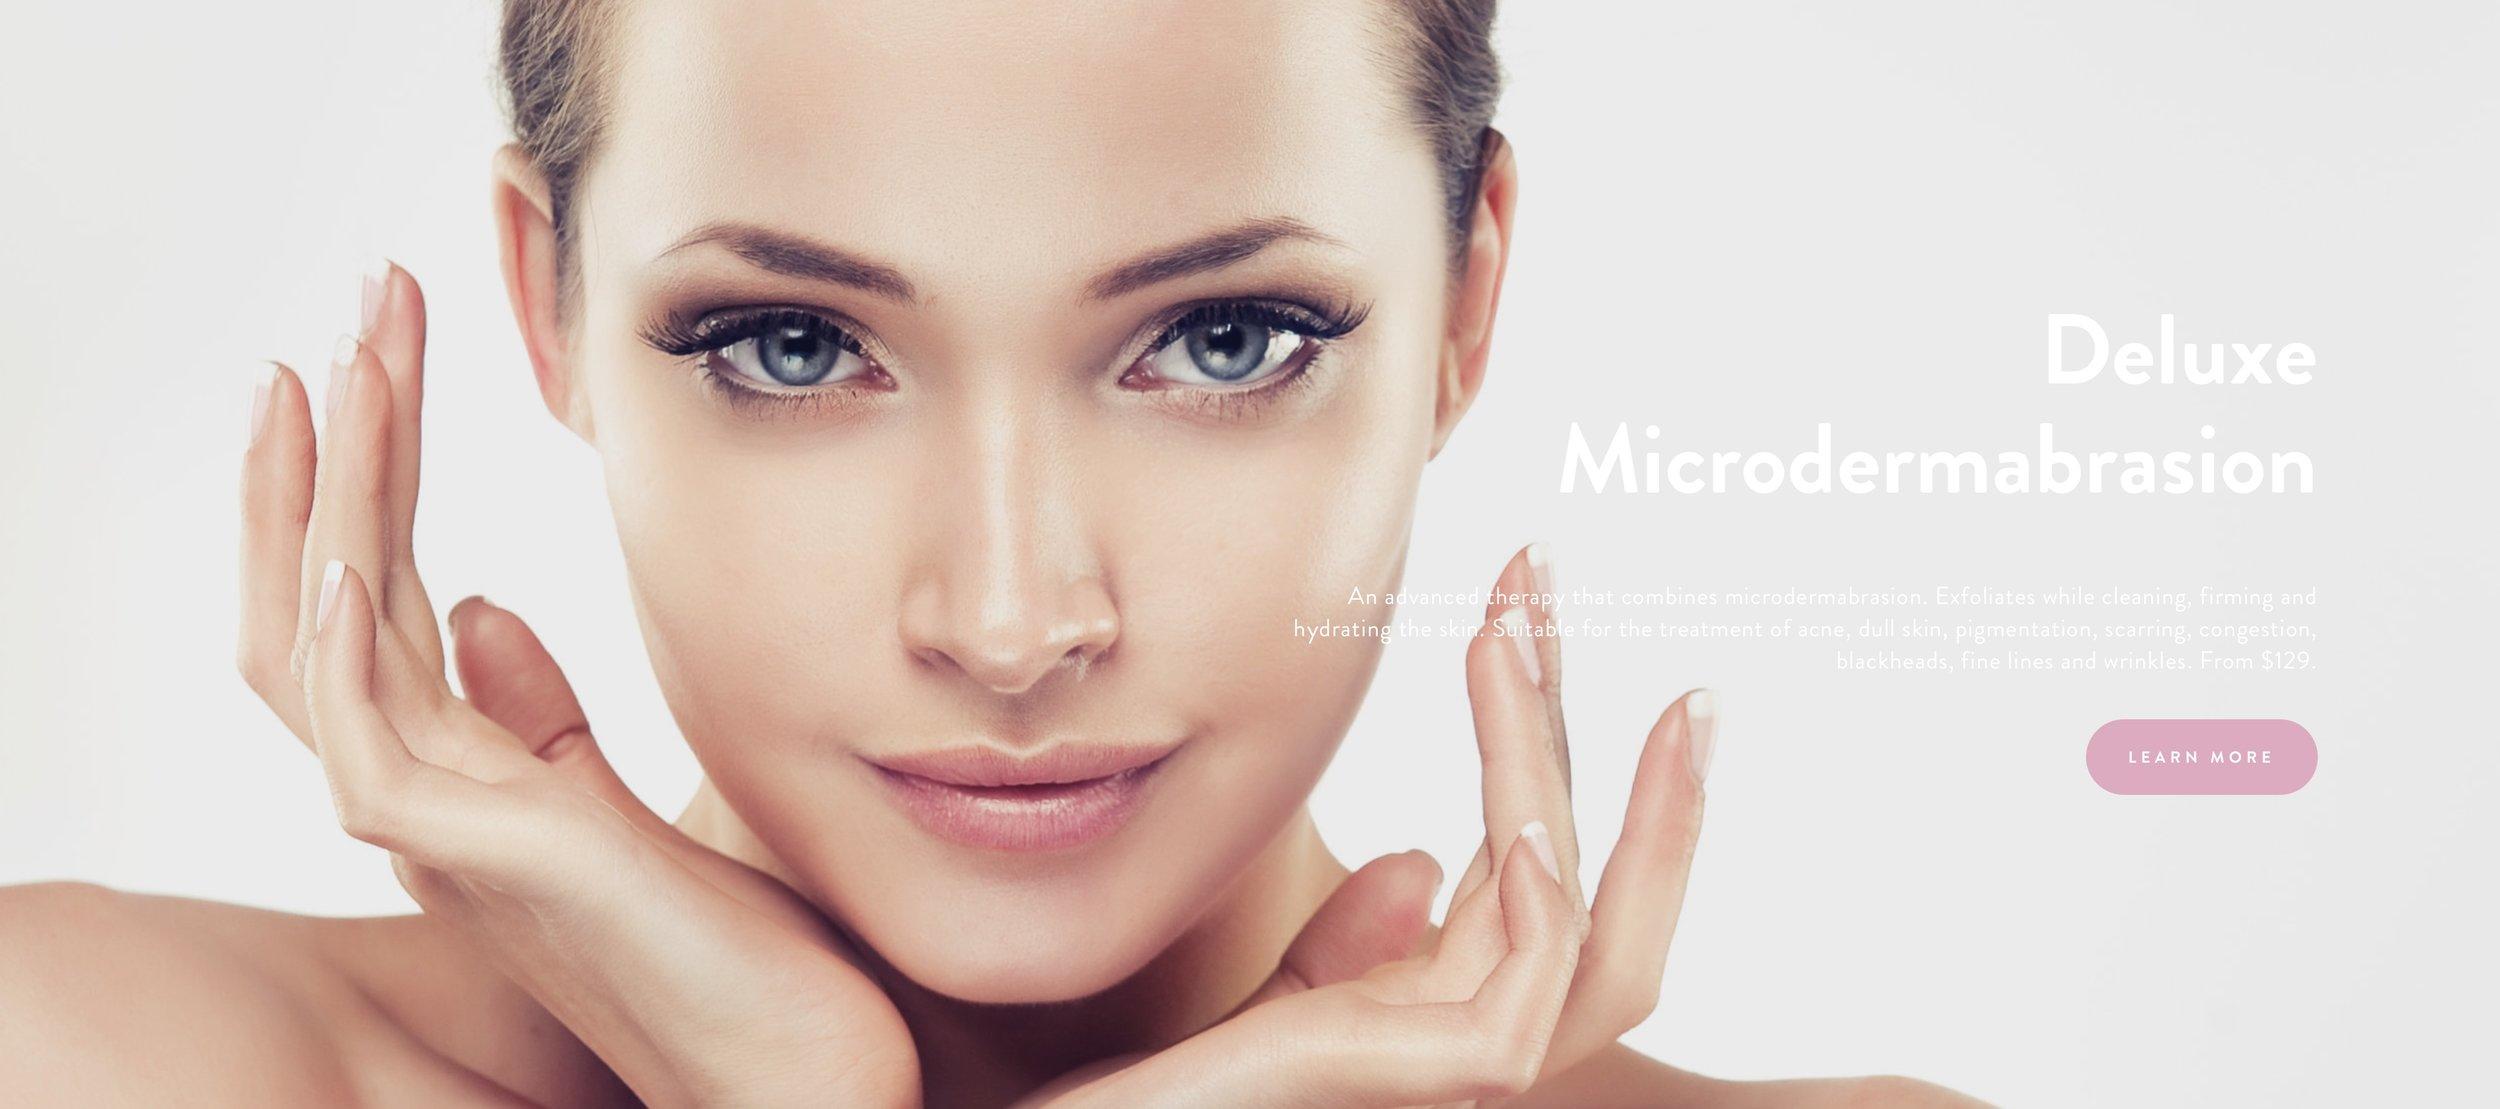 GC+Skin's+Website+5.jpg